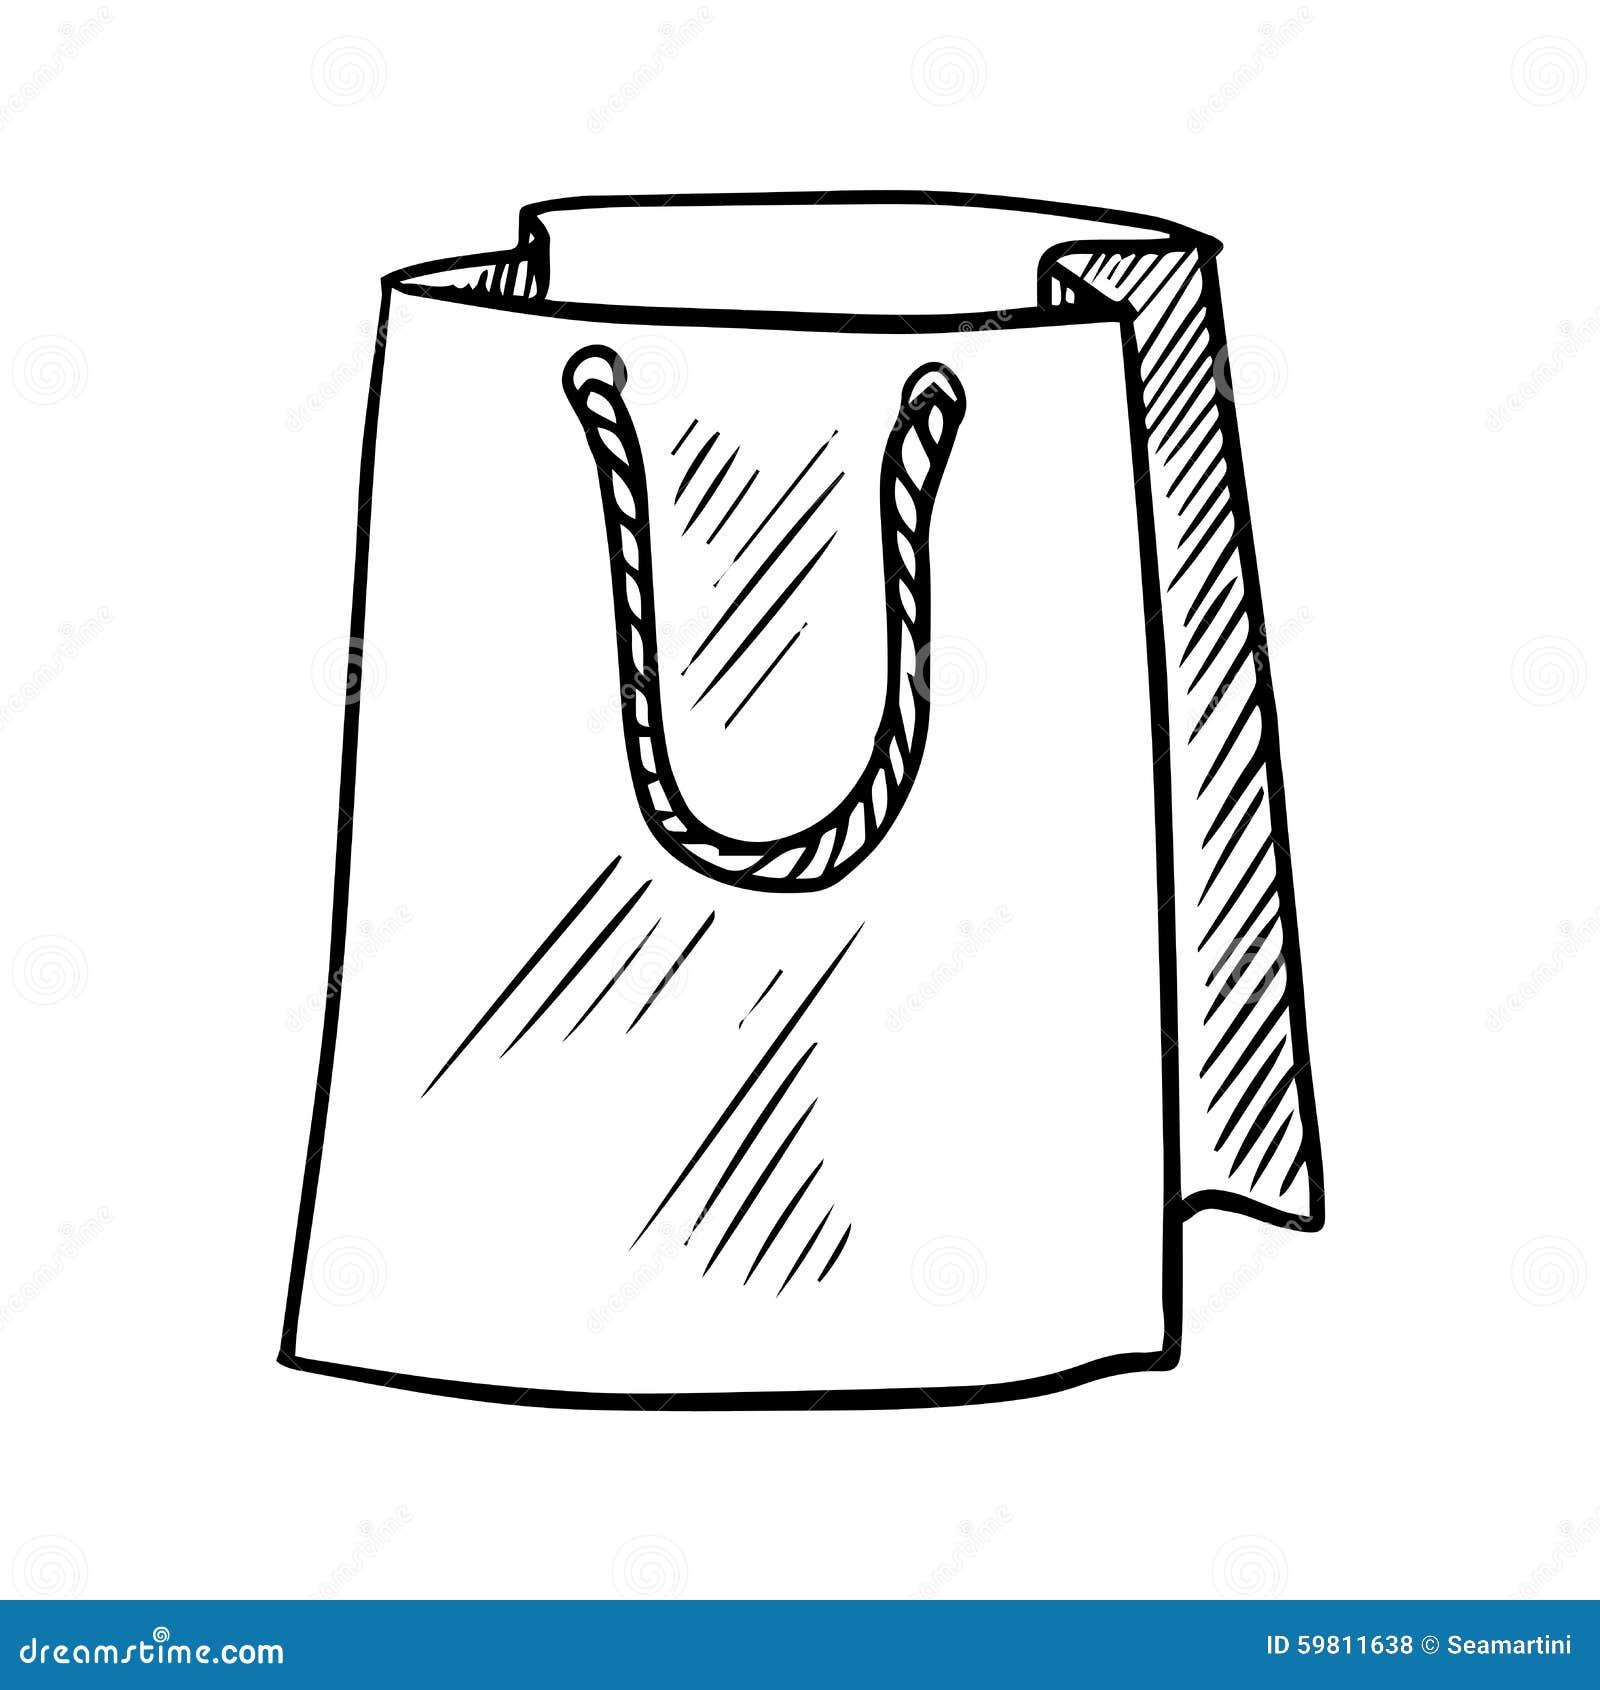 Paper bag sketch - Sketch Of Paper Shopping Bag